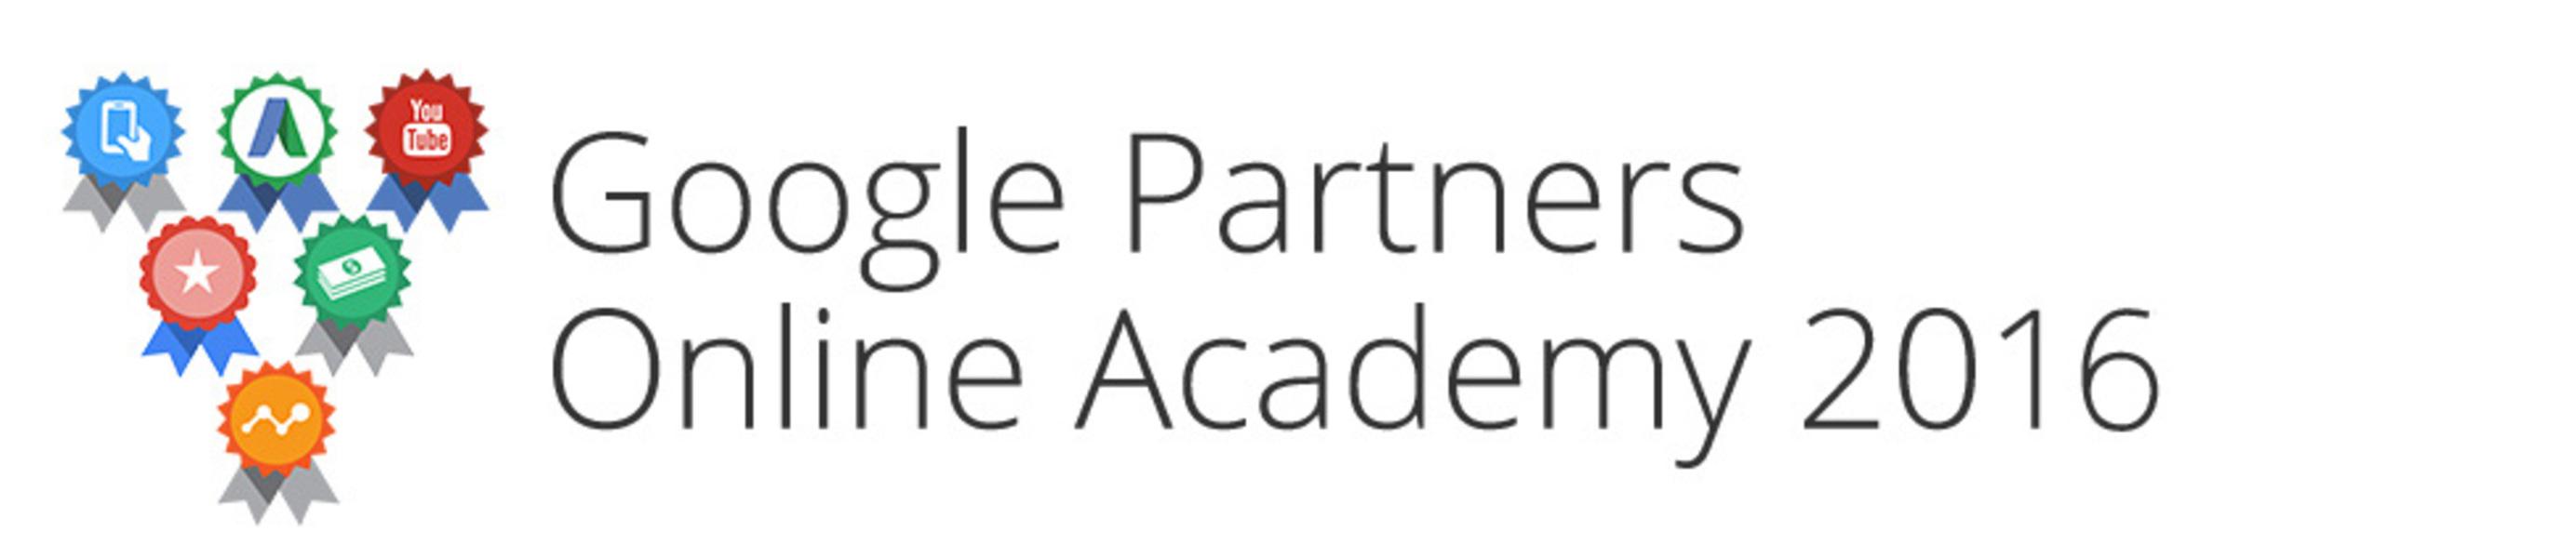 image-2016-01-25-20750668-70-google-partners-academy